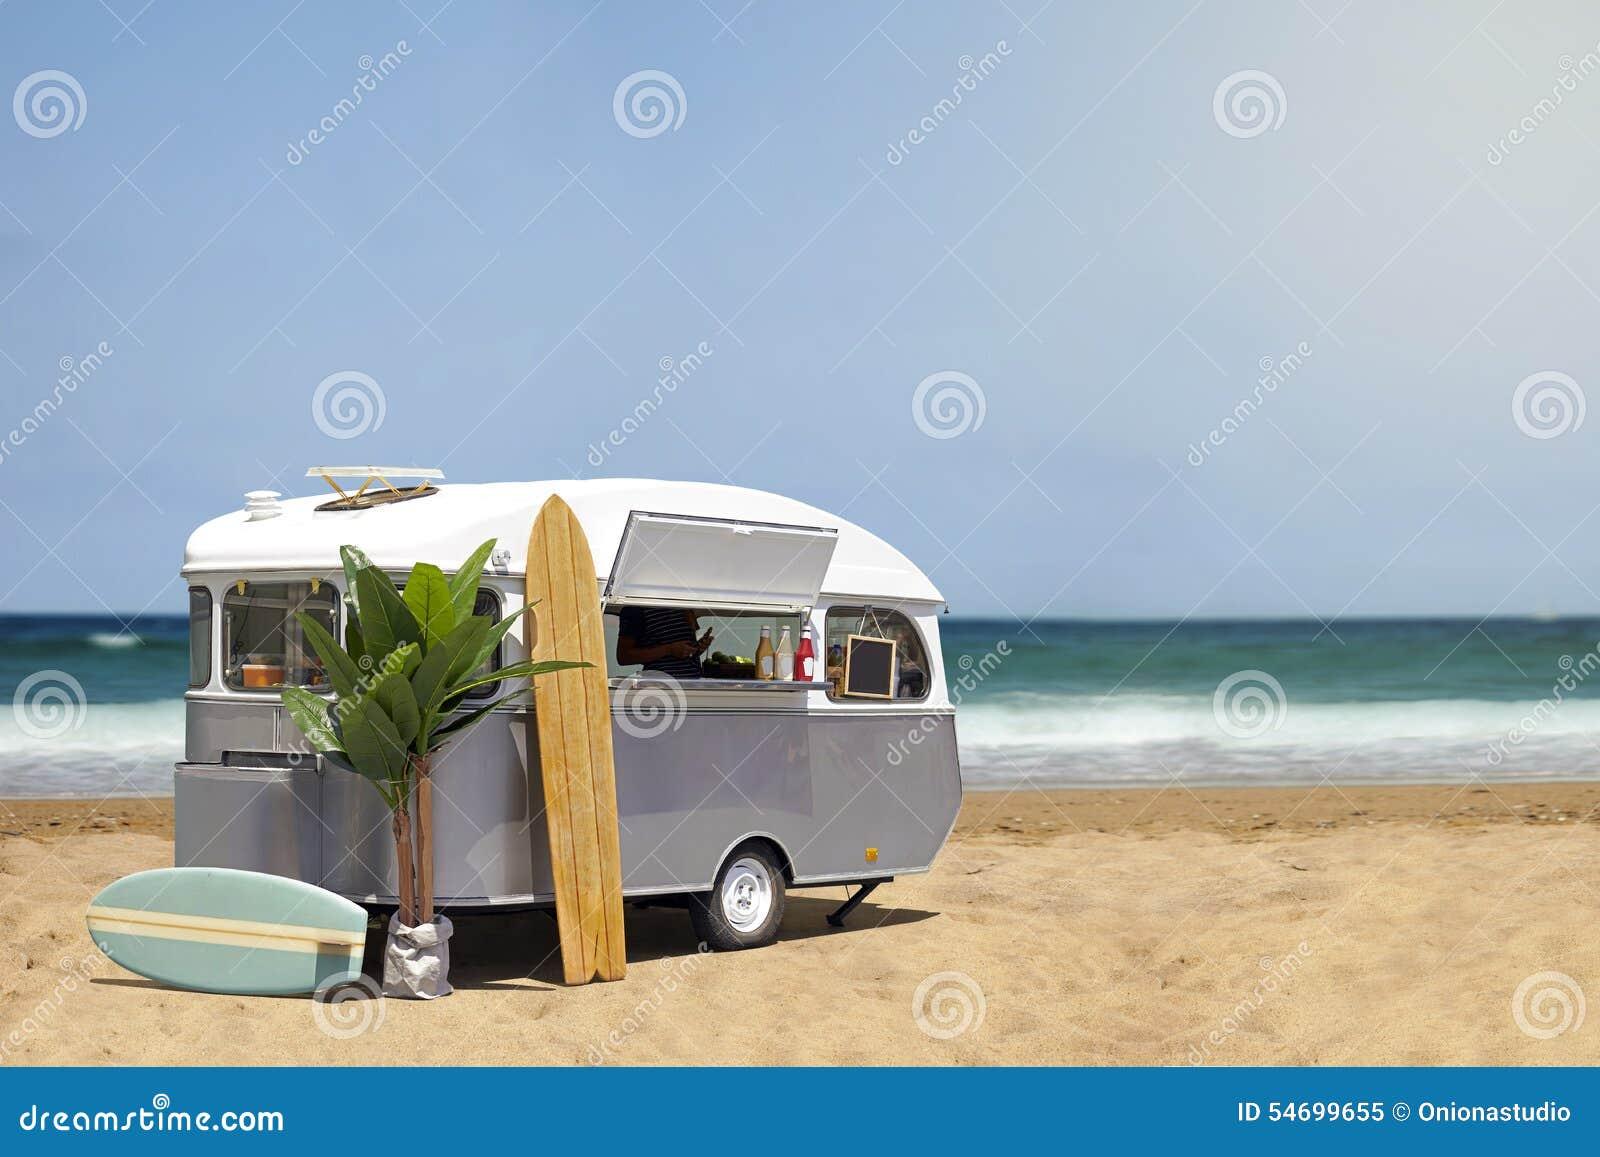 Food Truck Caravan On The Beach Stock Photo Image 54699655